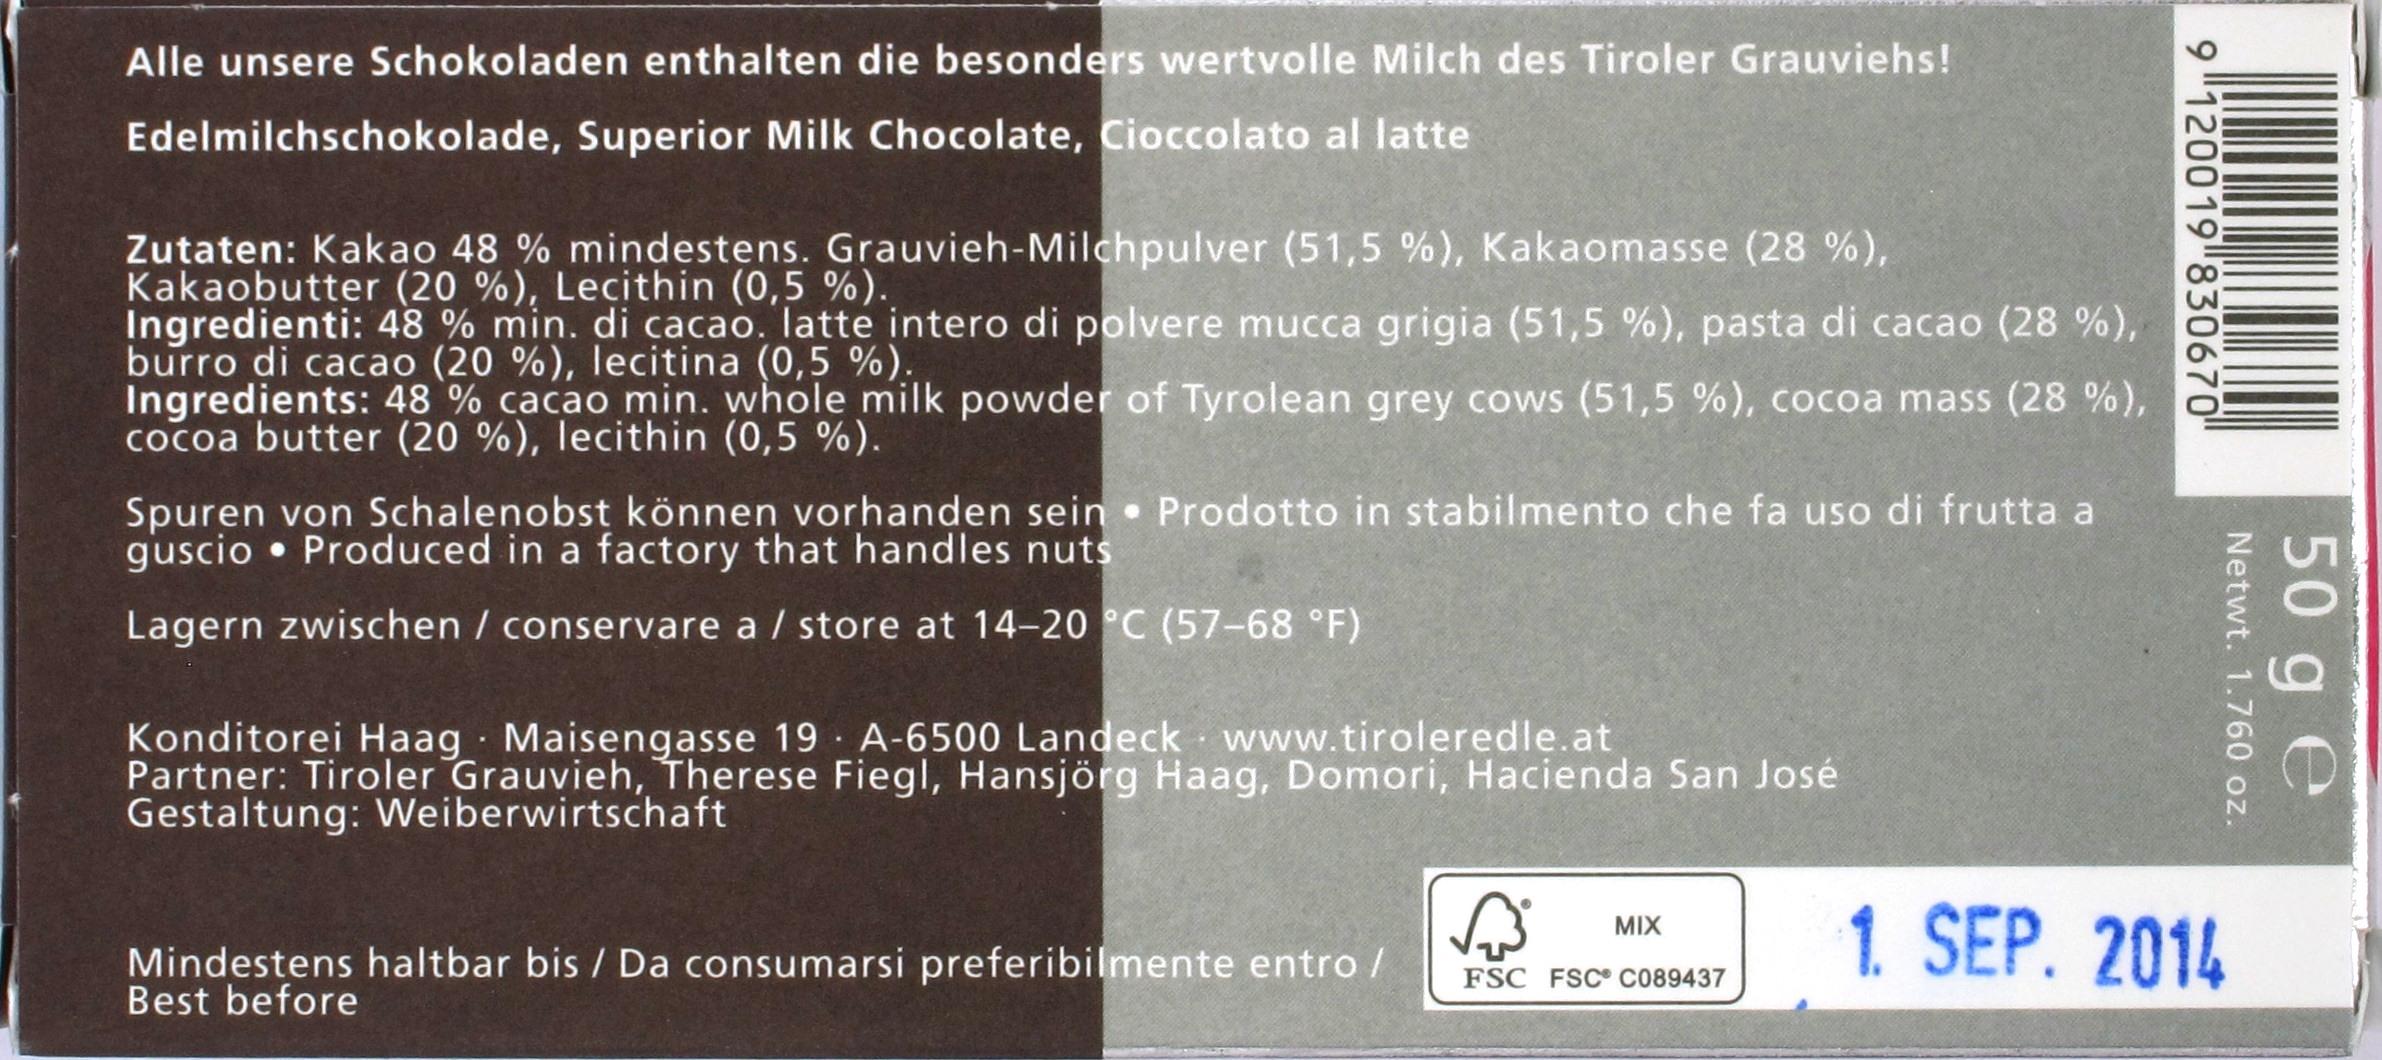 Inhaltsangaben: Purissima Maxima 48% von Tiroler Edle